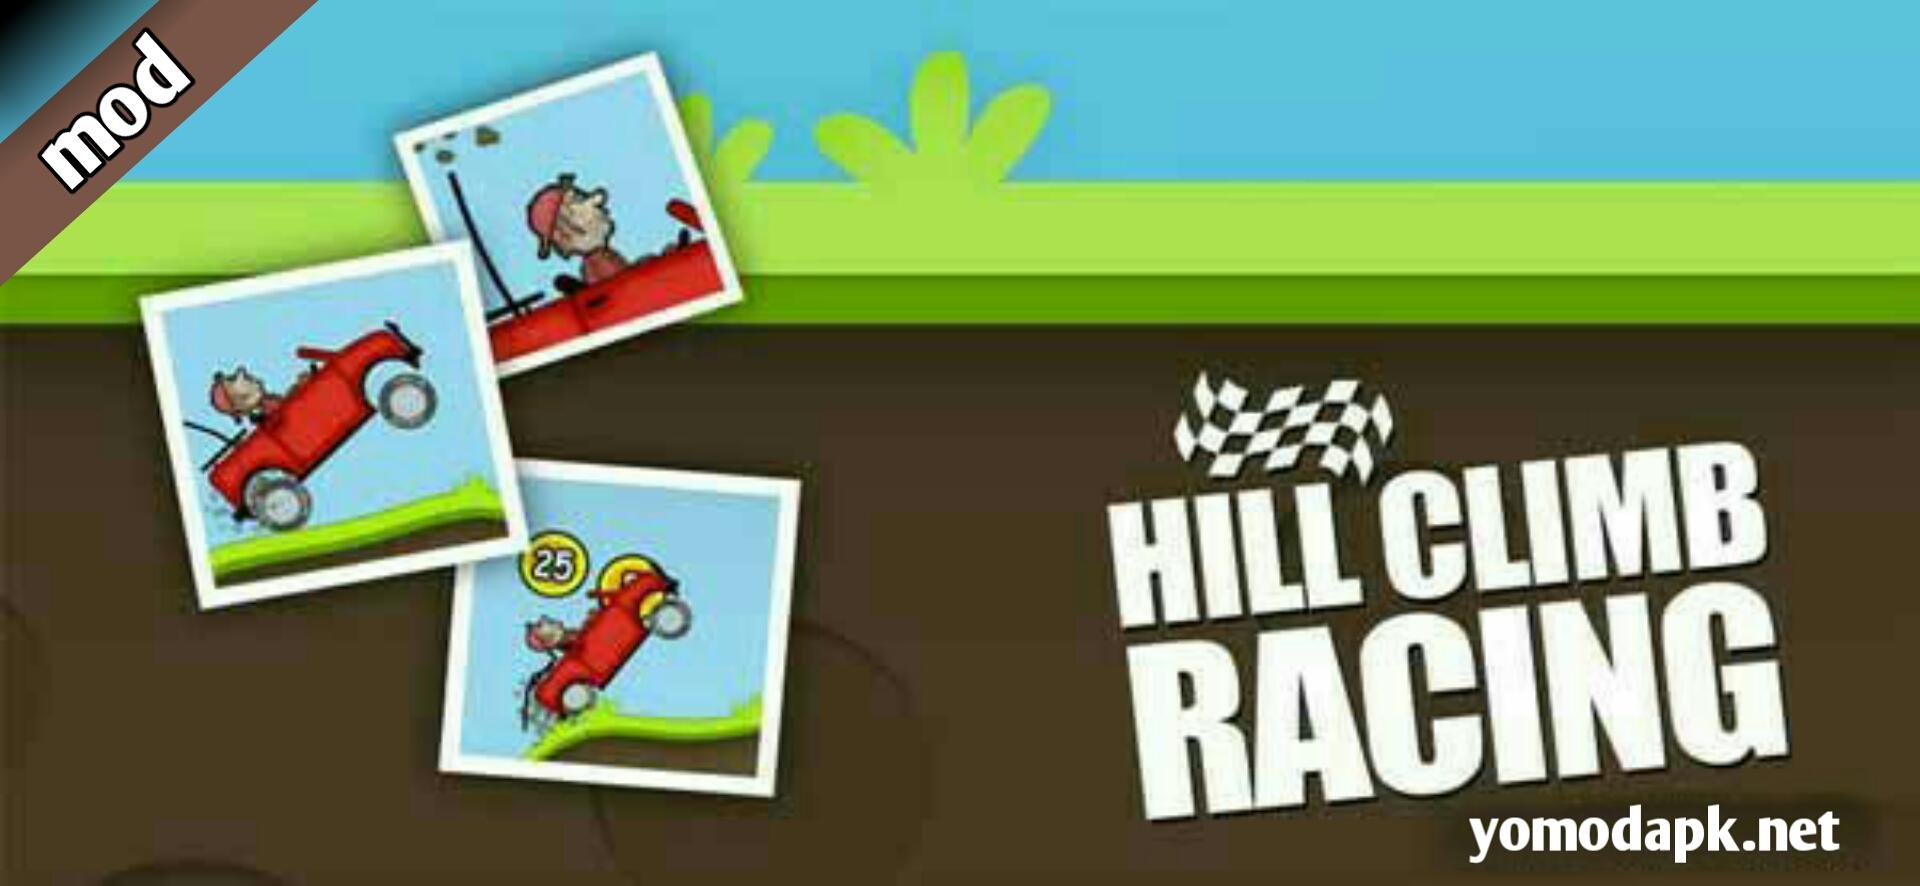 Hill Climb Racing MOD APK 1.47.7 (Unlimited Money)